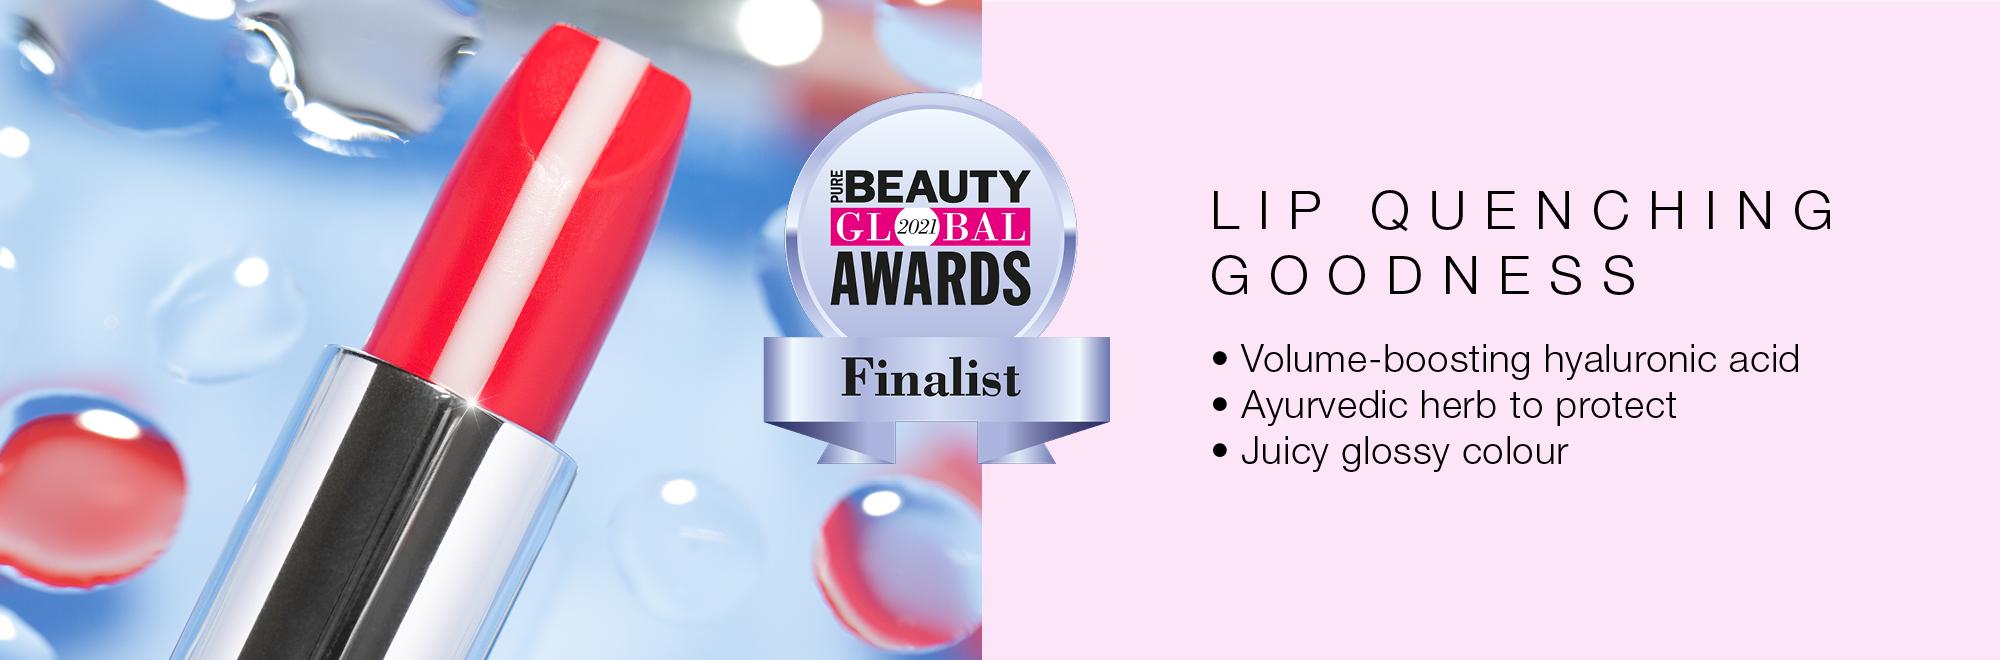 Mii Cosmetics Hydraboost Lip Lover Lipstick